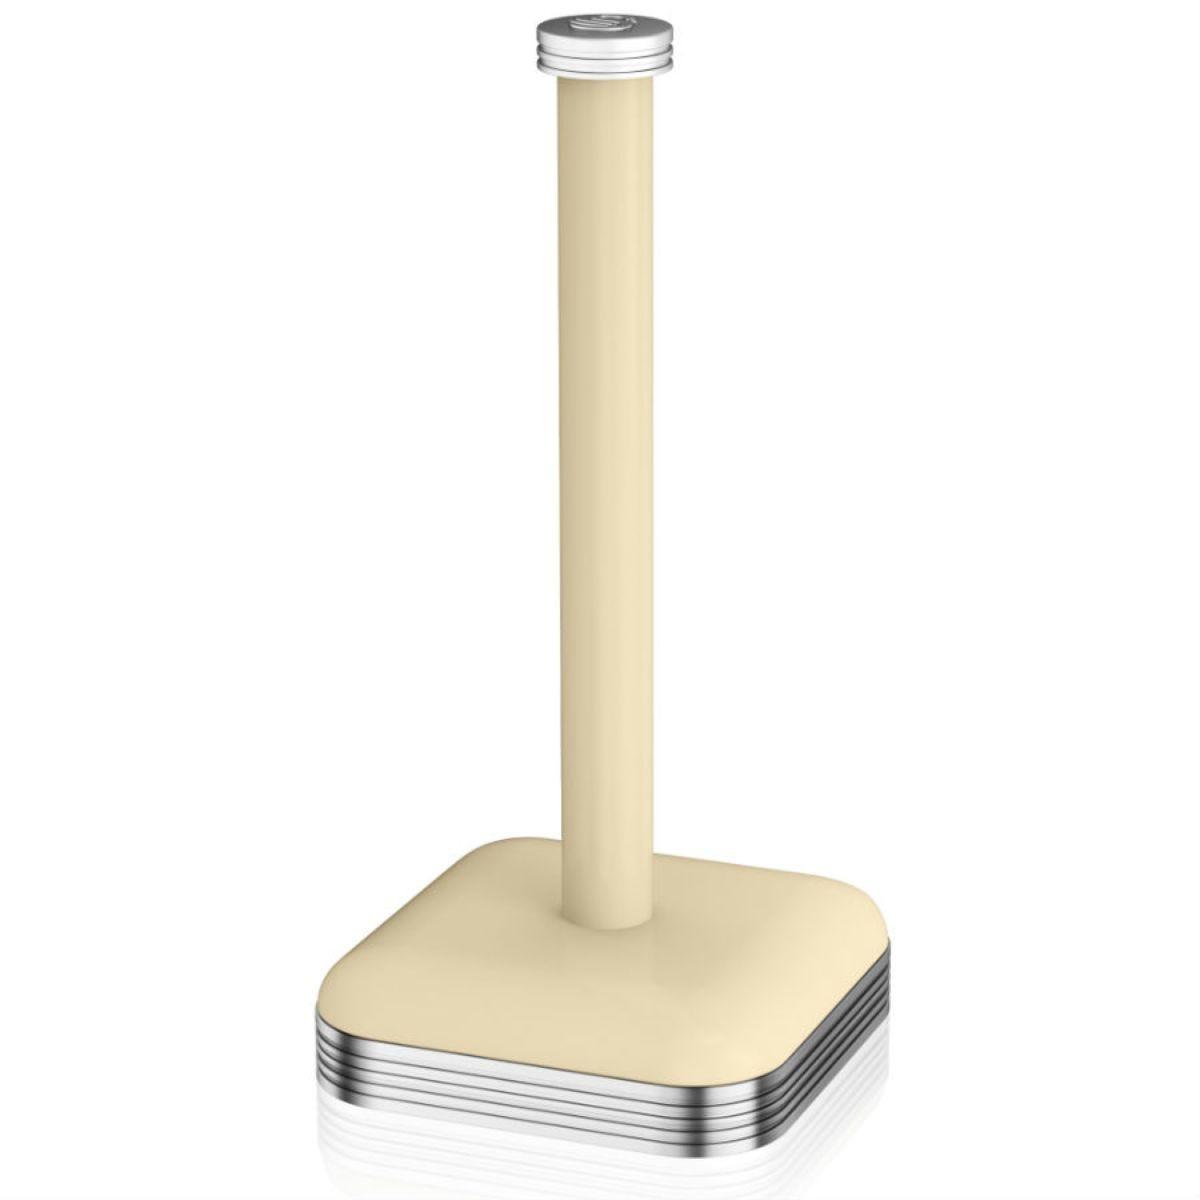 Swan Retro Towel Pole - Cream